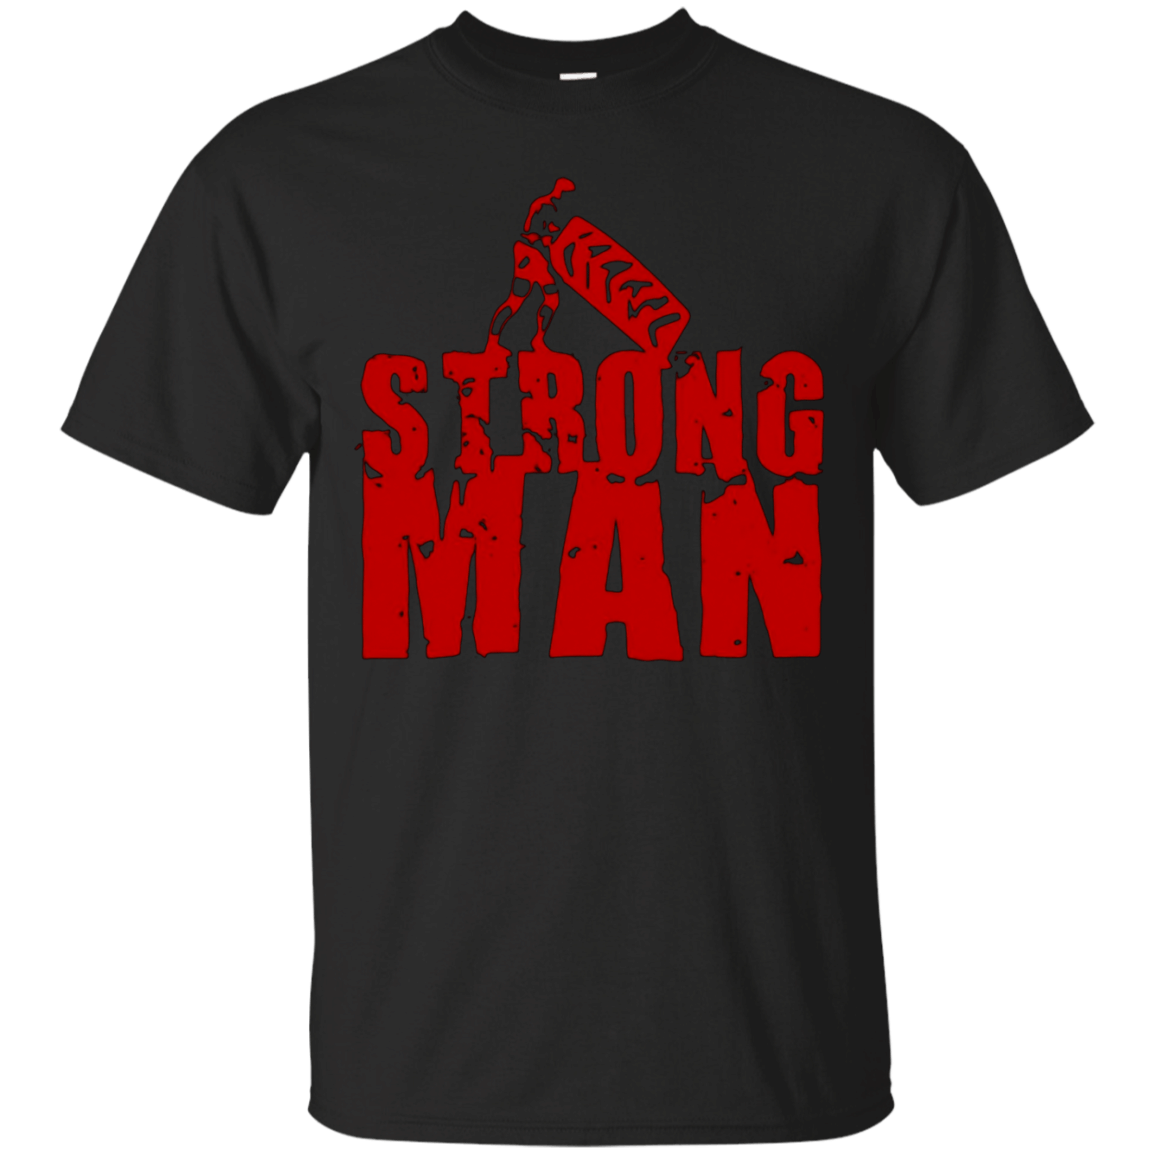 STRONGMAN T-SHIRT Powerlifting Gym Weights Powerlifting Tee